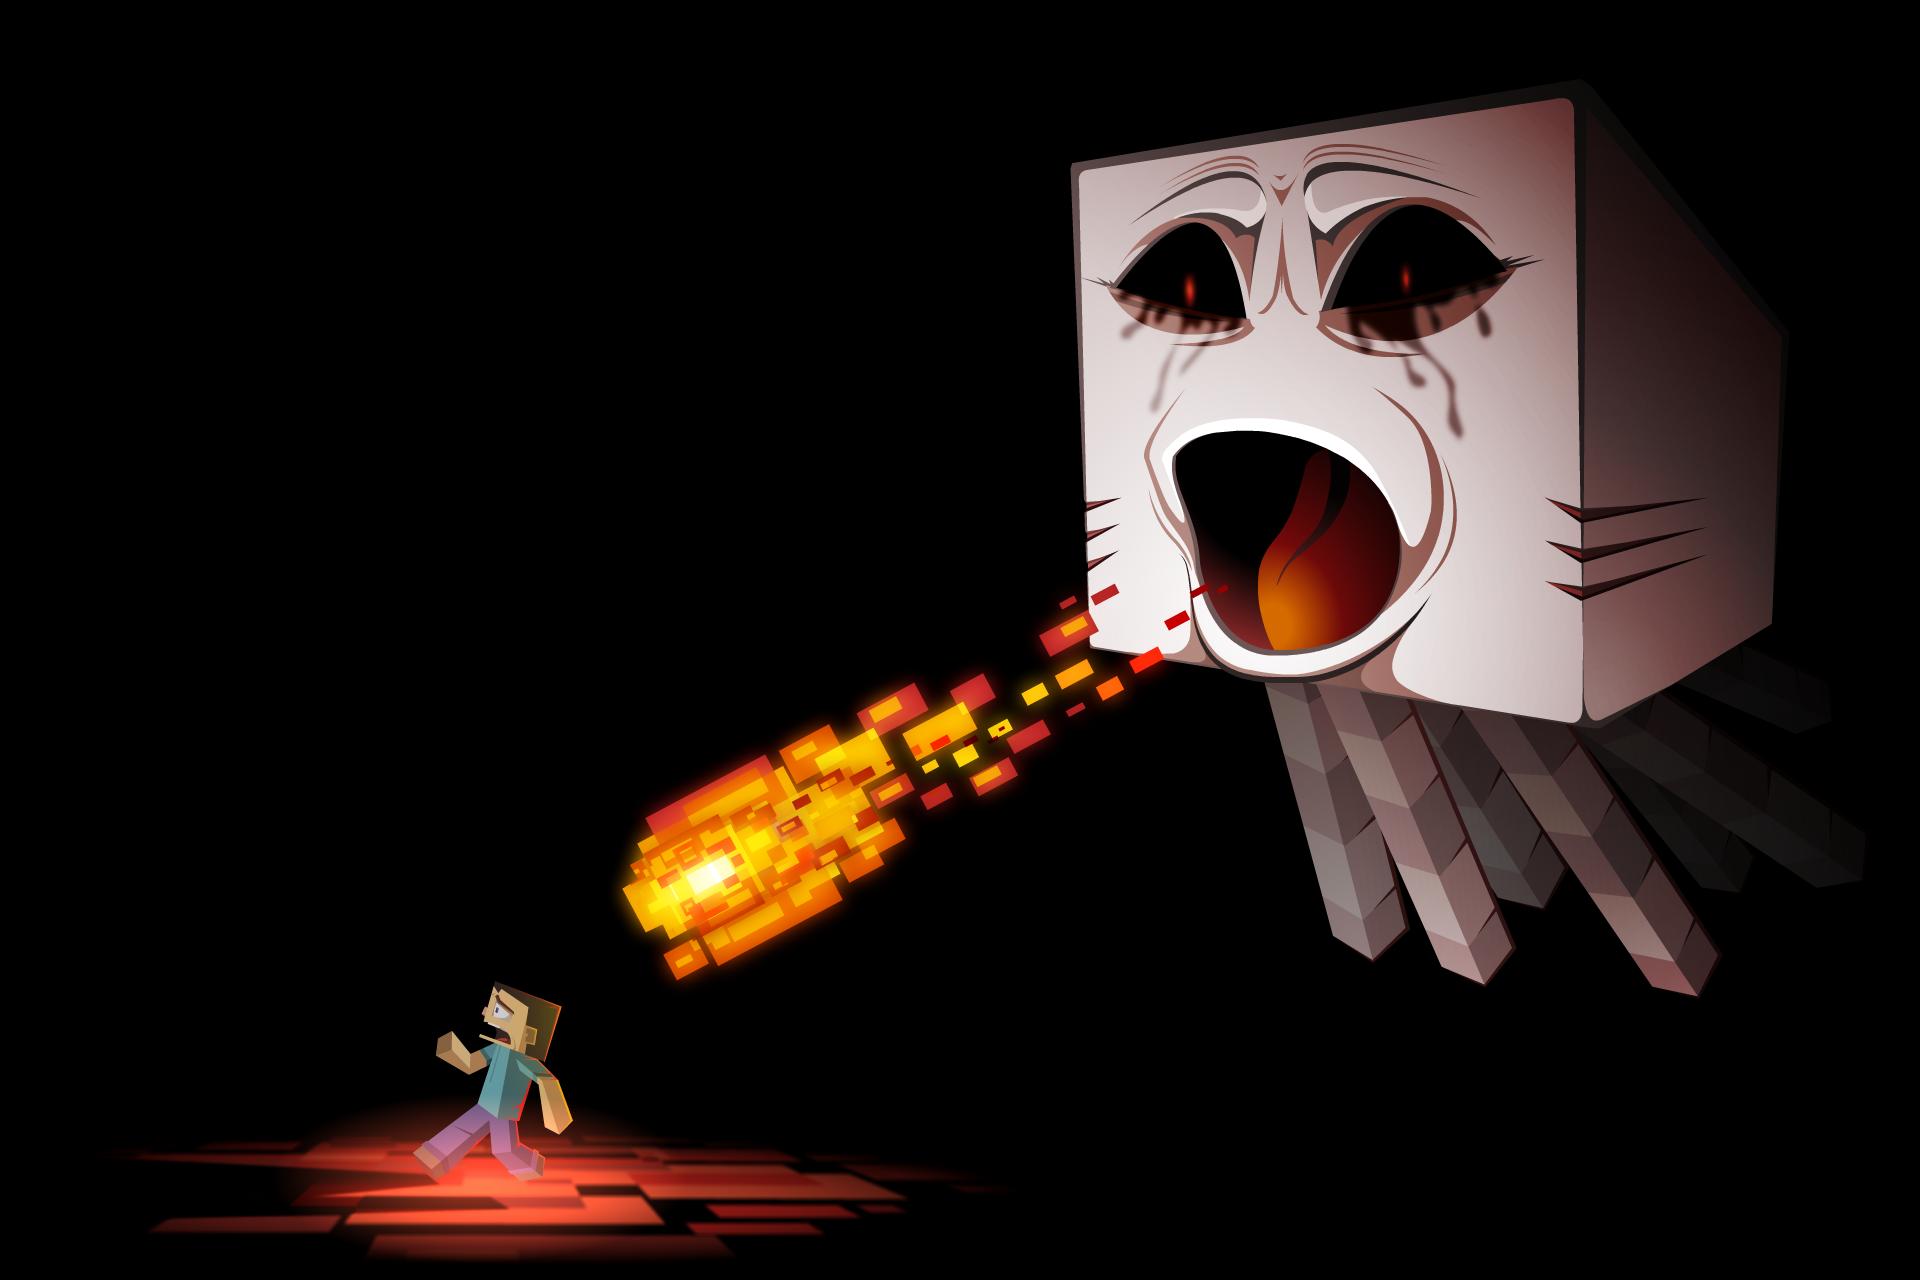 Minecraft HD Wallpaper Background Image 1920x1280 ID204476 1920x1280